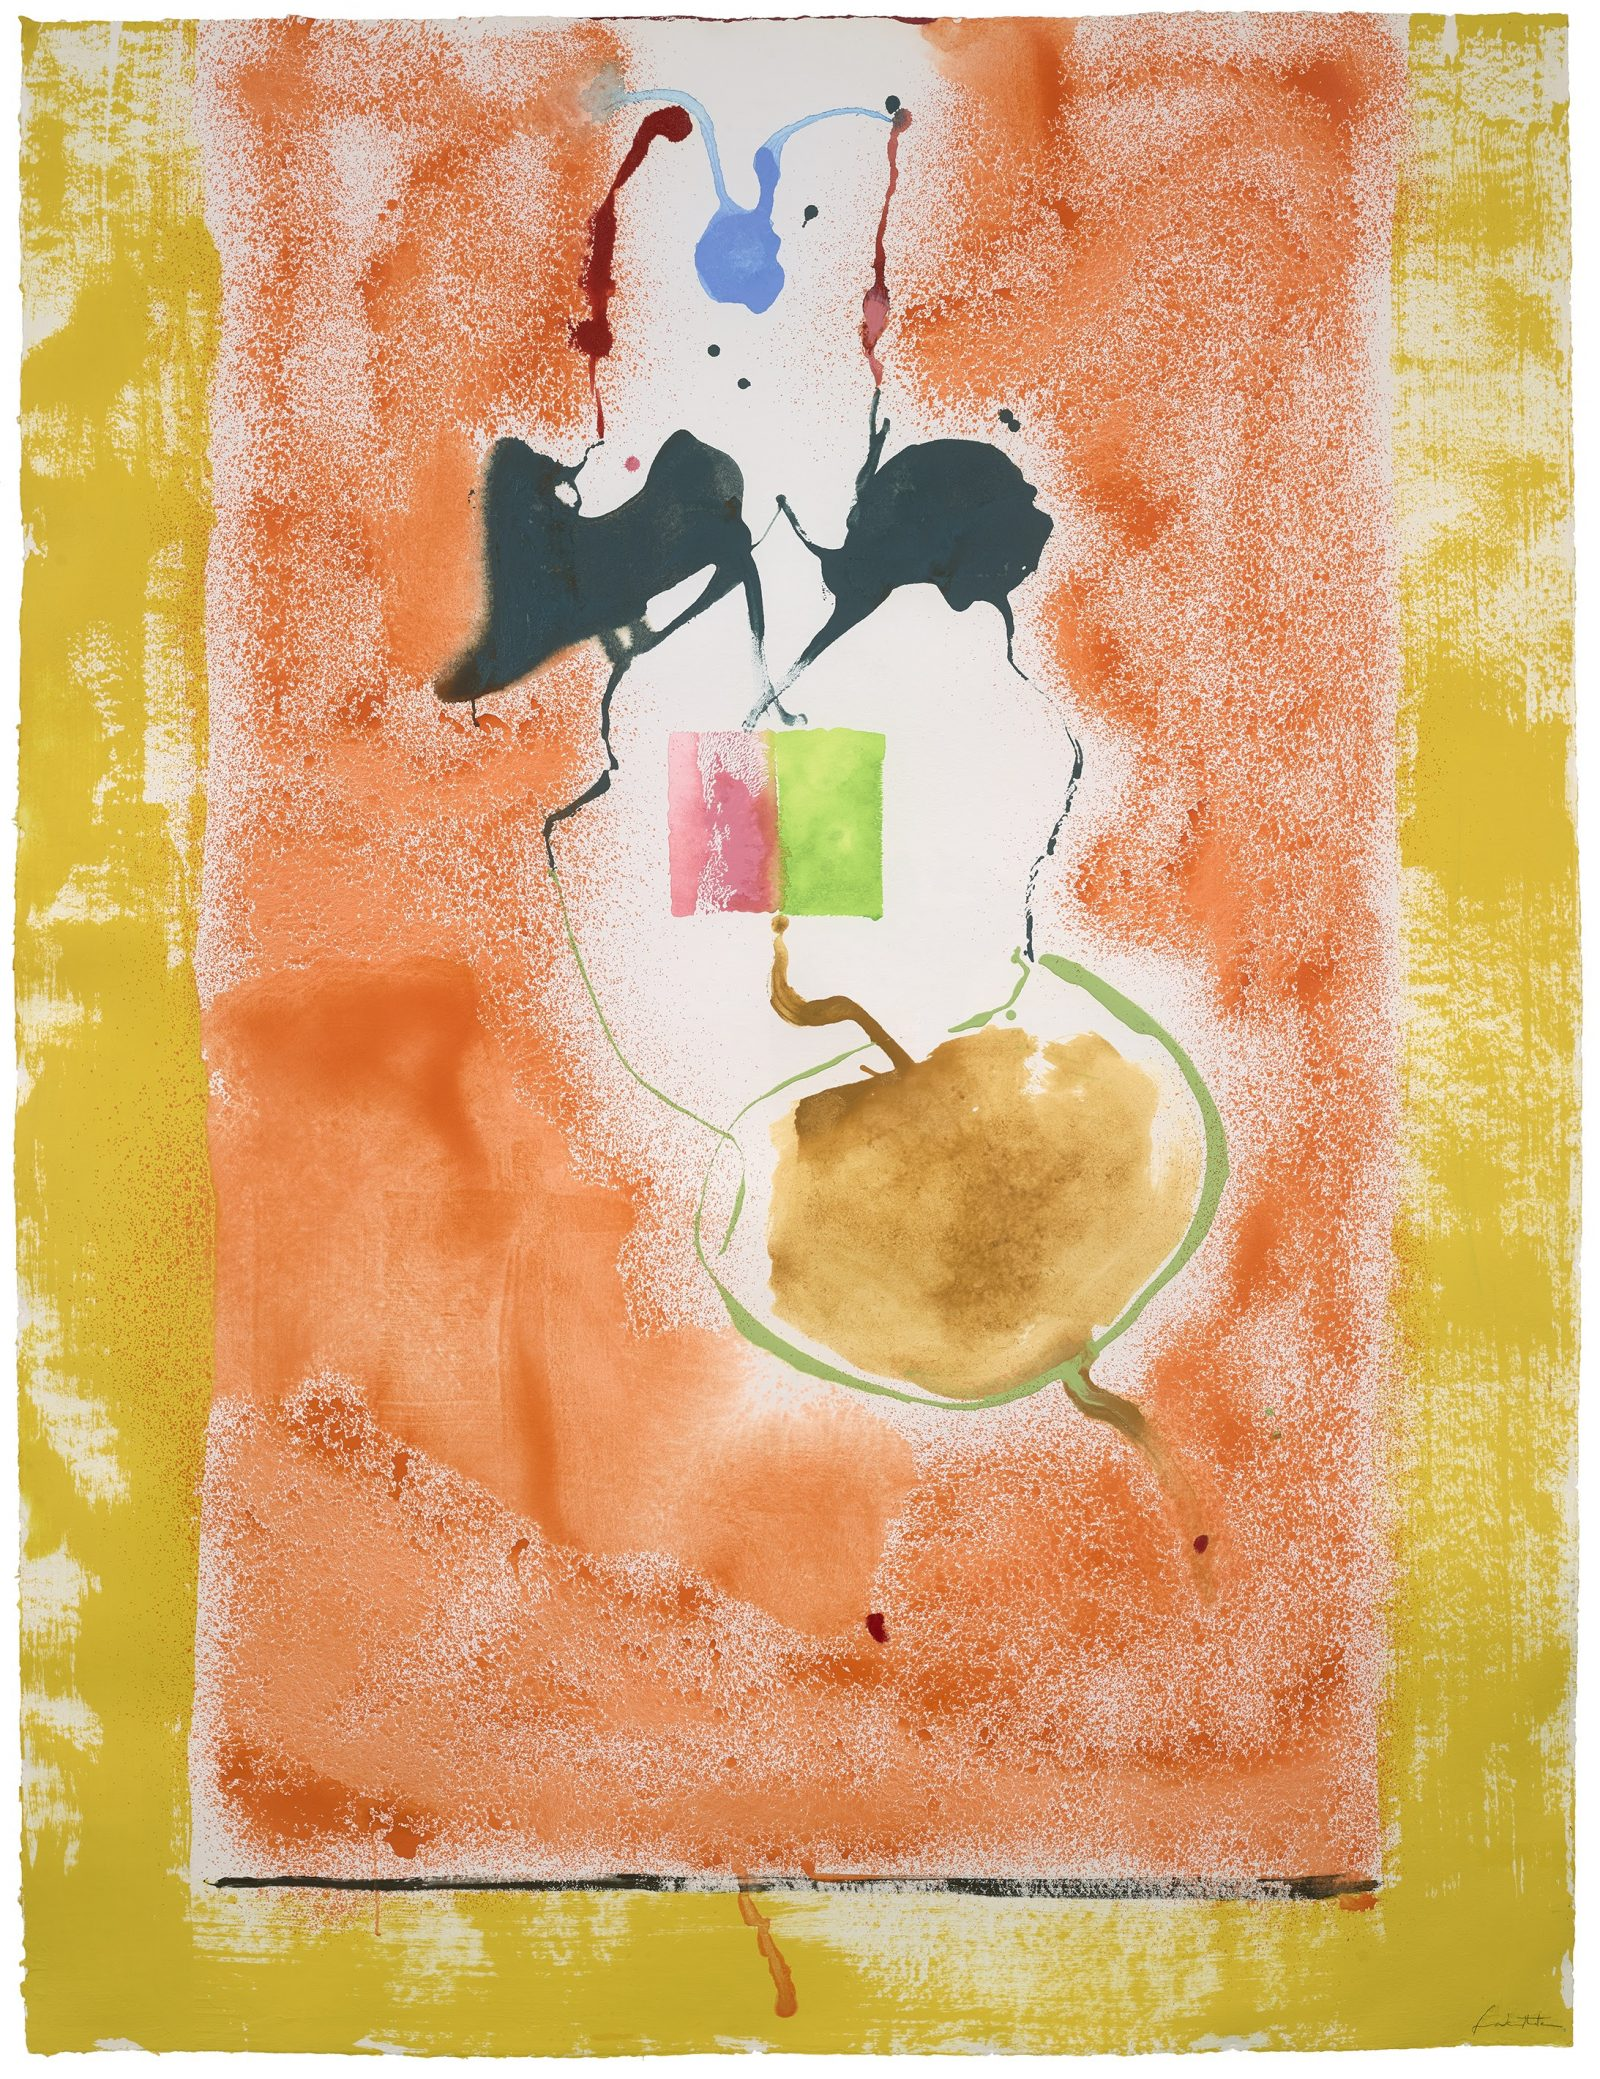 Helen Frankenthaler, Solar Imp, 1995 Collection: Helen Frankenthaler Foundation © 2020 Helen Frankenthaler Foundation, Inc. / Artists Rights Society (ARS), New York